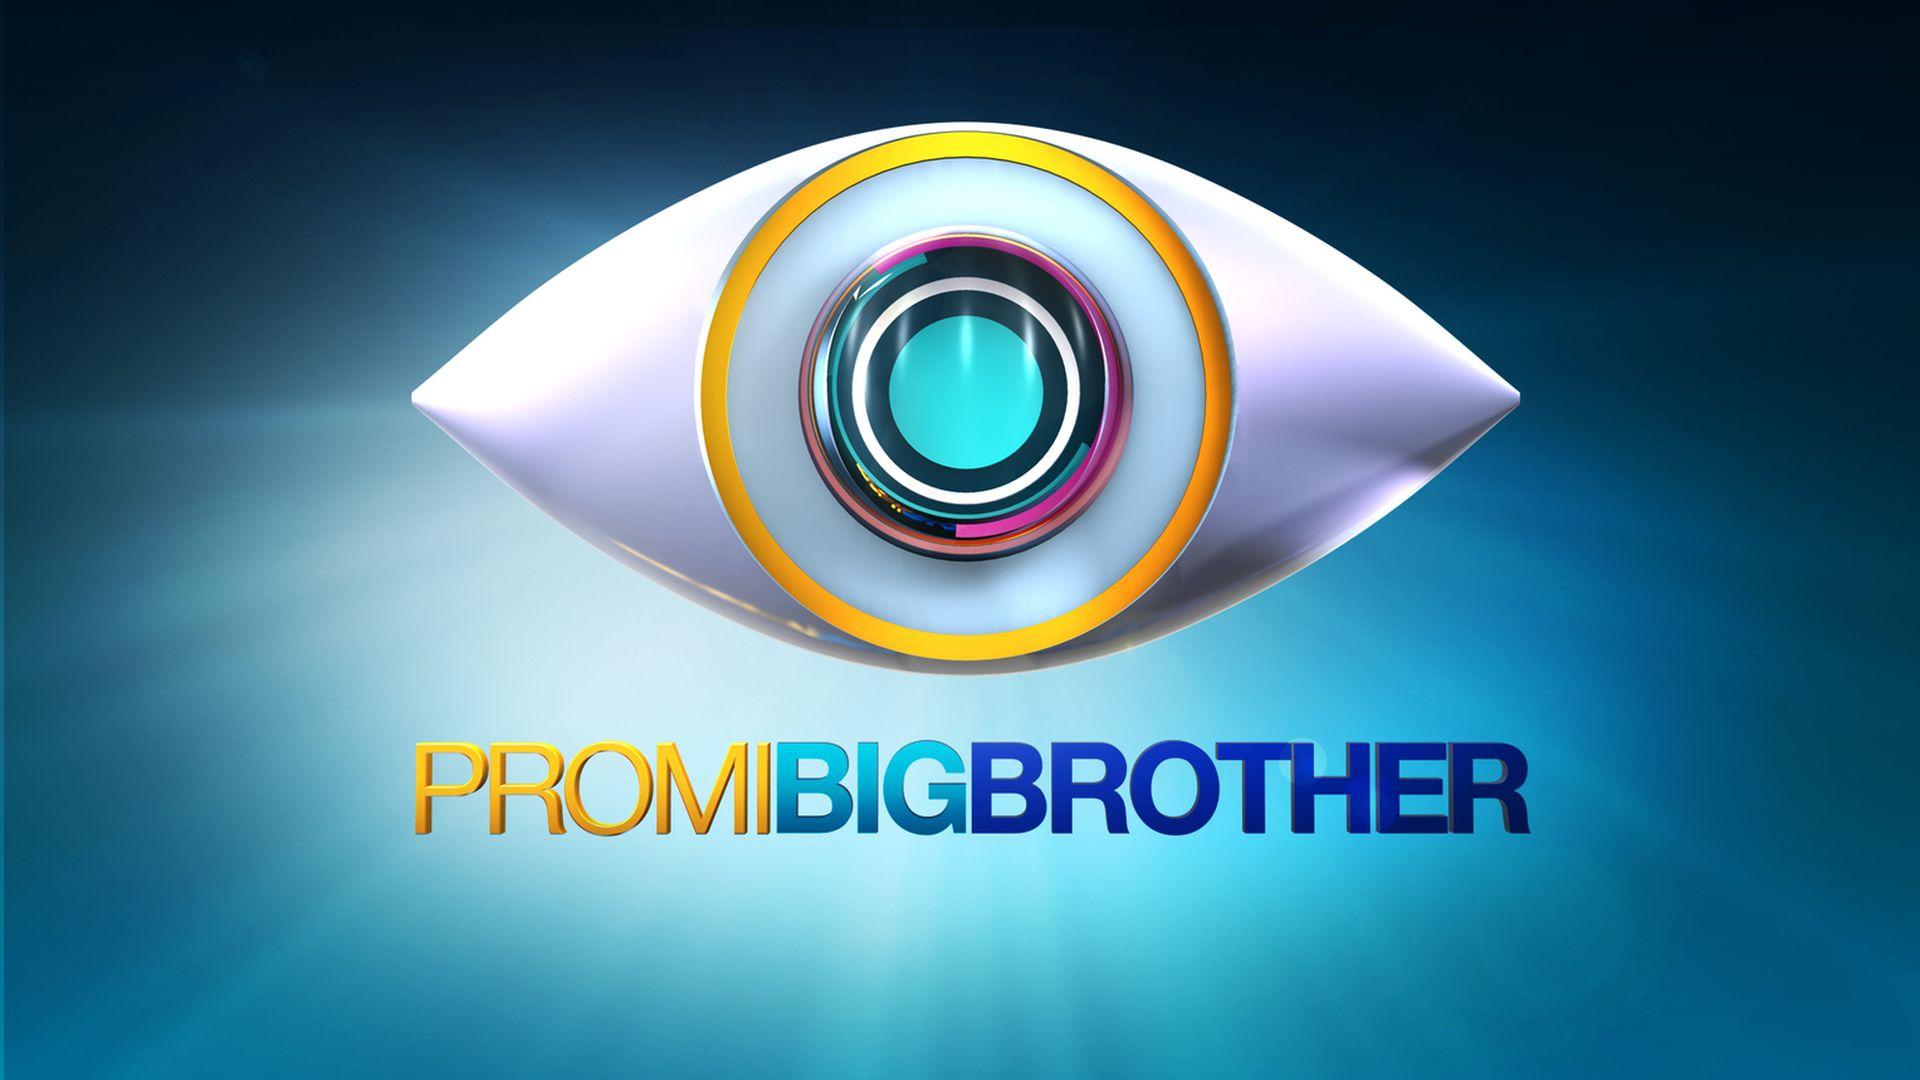 Promi Big Brother 2017 Start